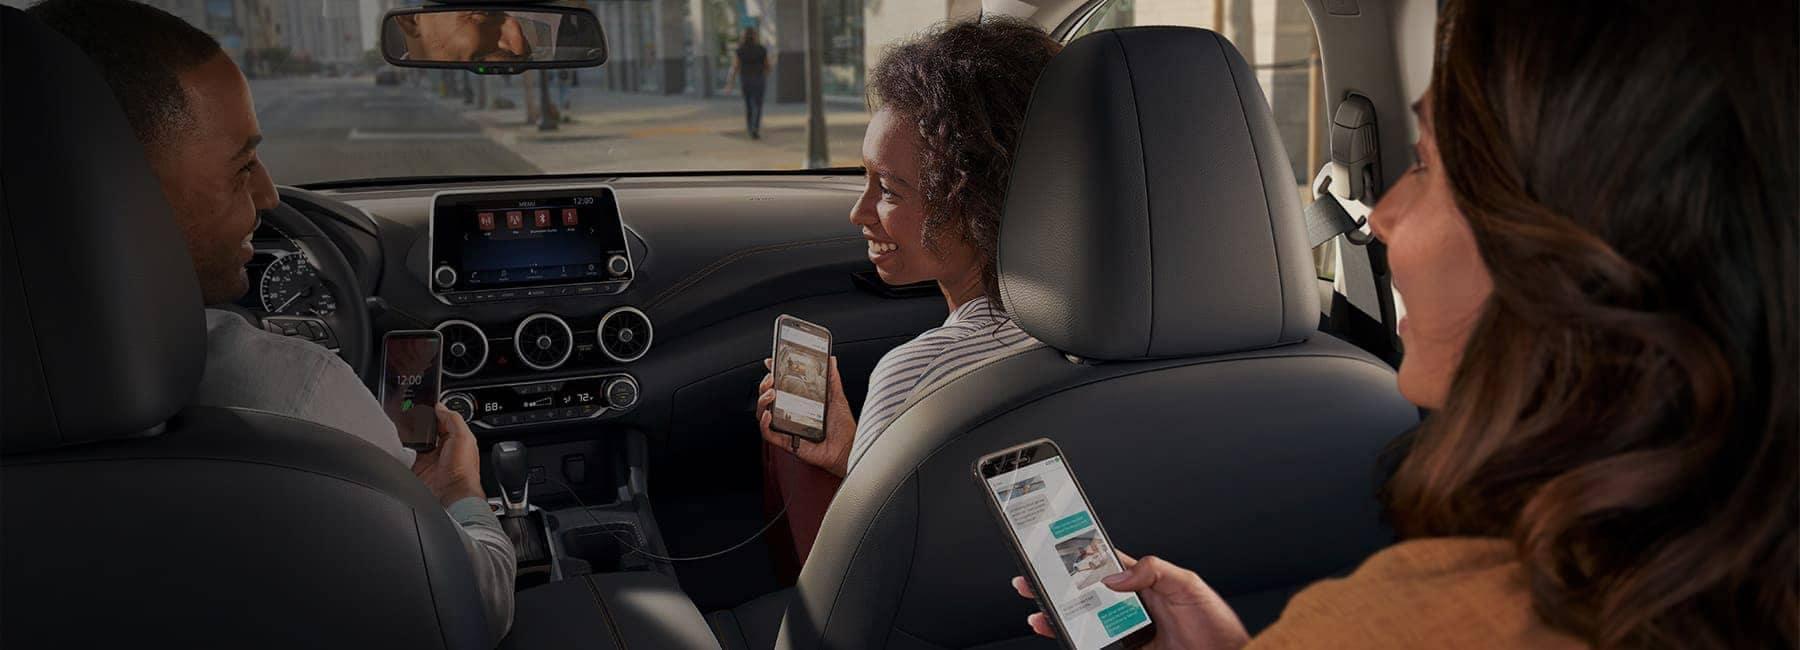 2020 Nissan Sentra Interior lifestyle phone shot